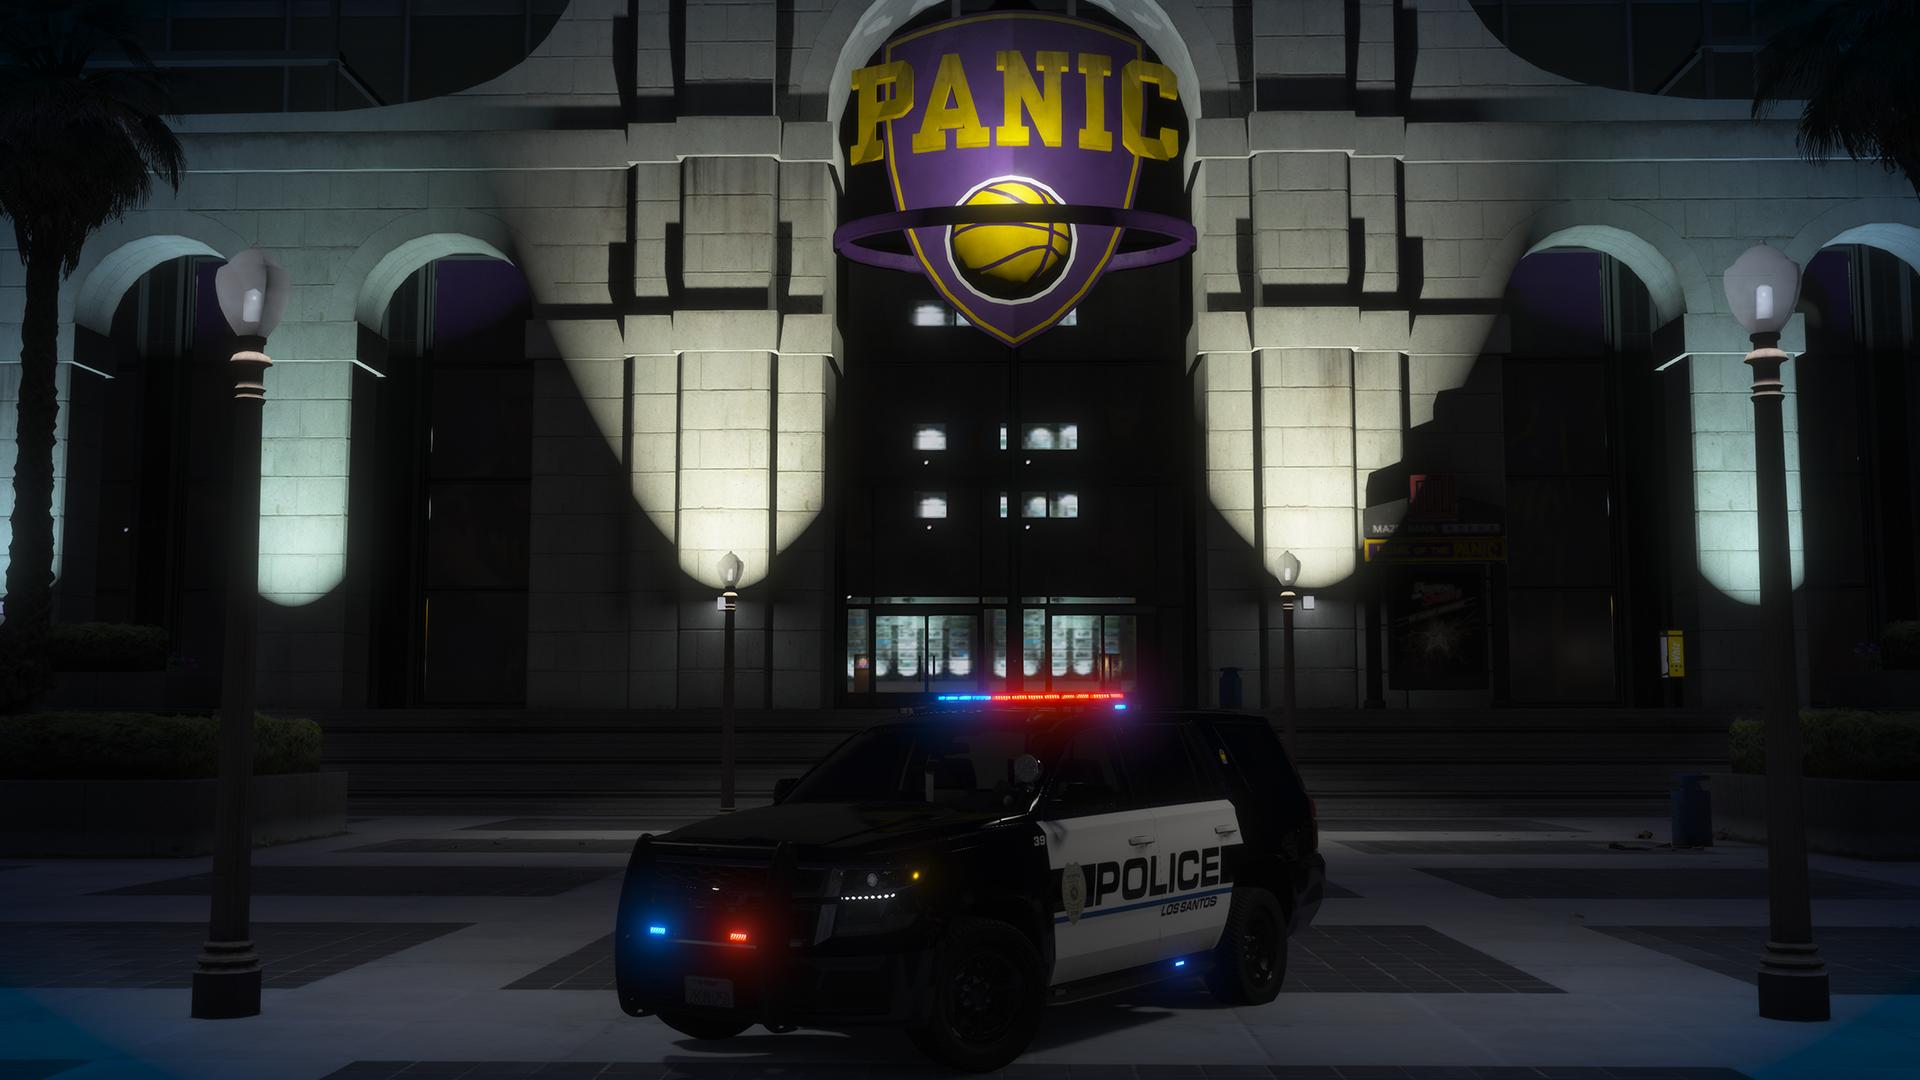 Grand_Theft_Auto_V_7_25_2020_11_54_34_PM.png.84c68771de46f156bf1fe5ab48ee2424.png